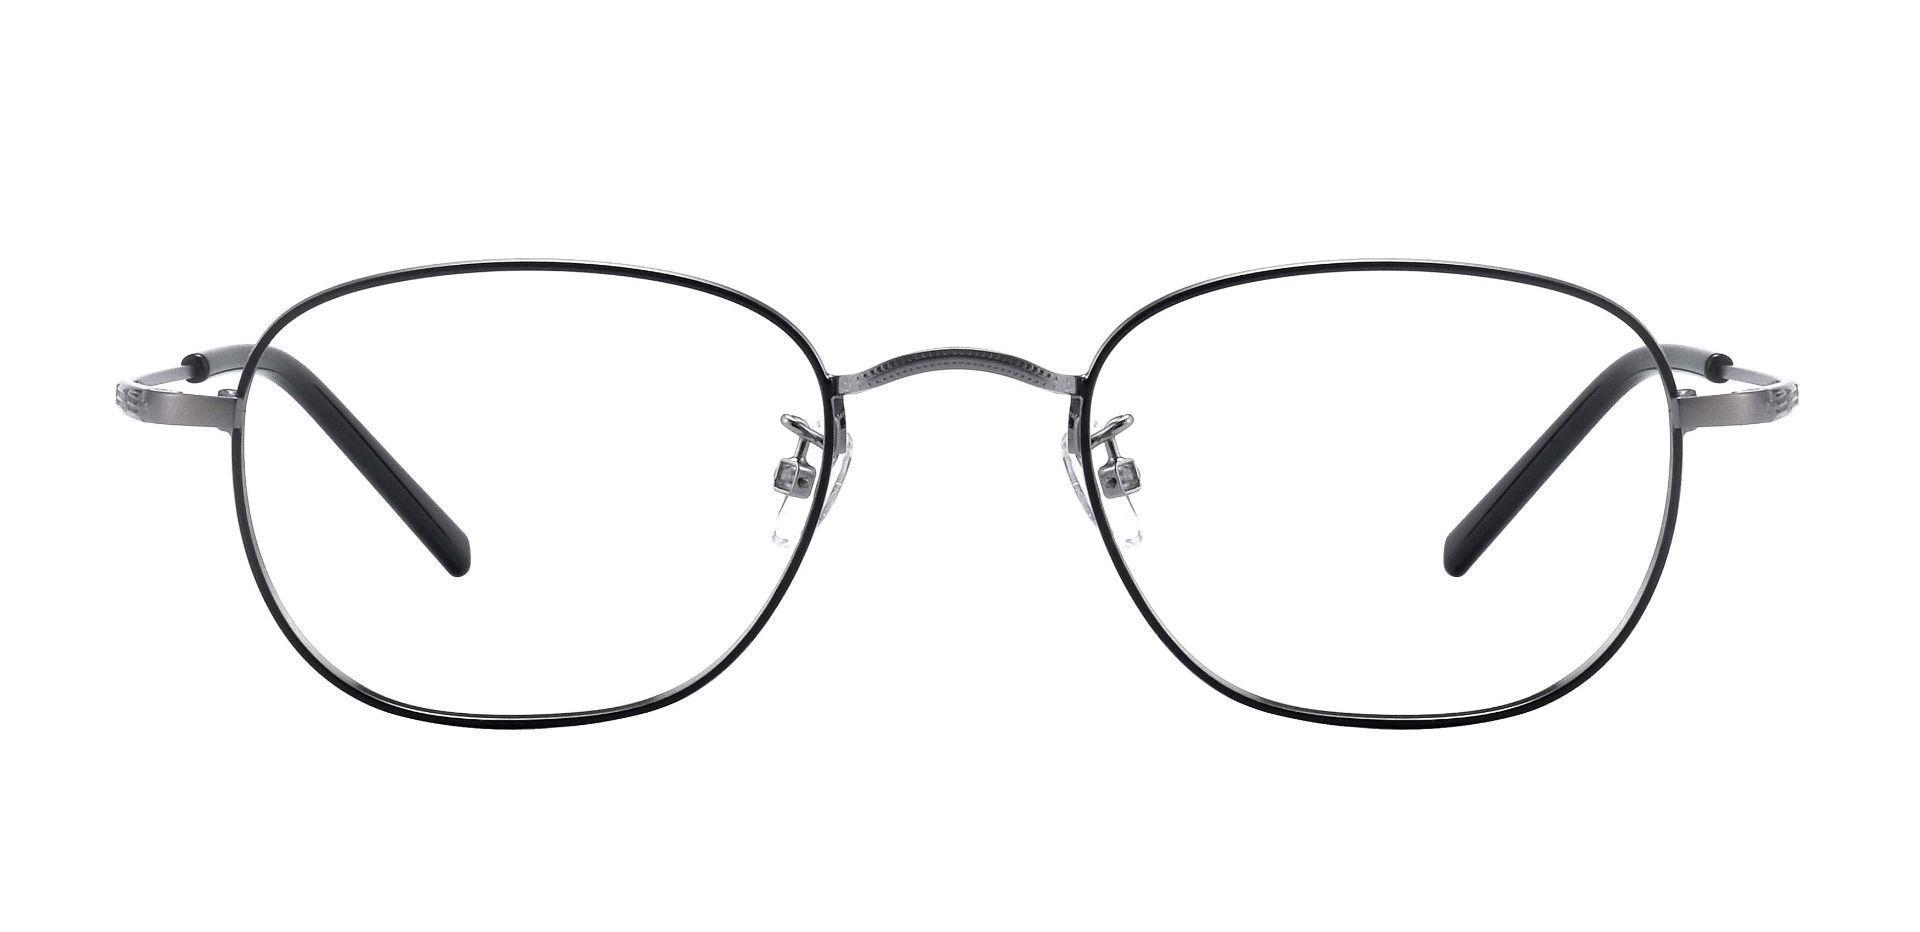 Caspian Oval Prescription Glasses - Black/pewter